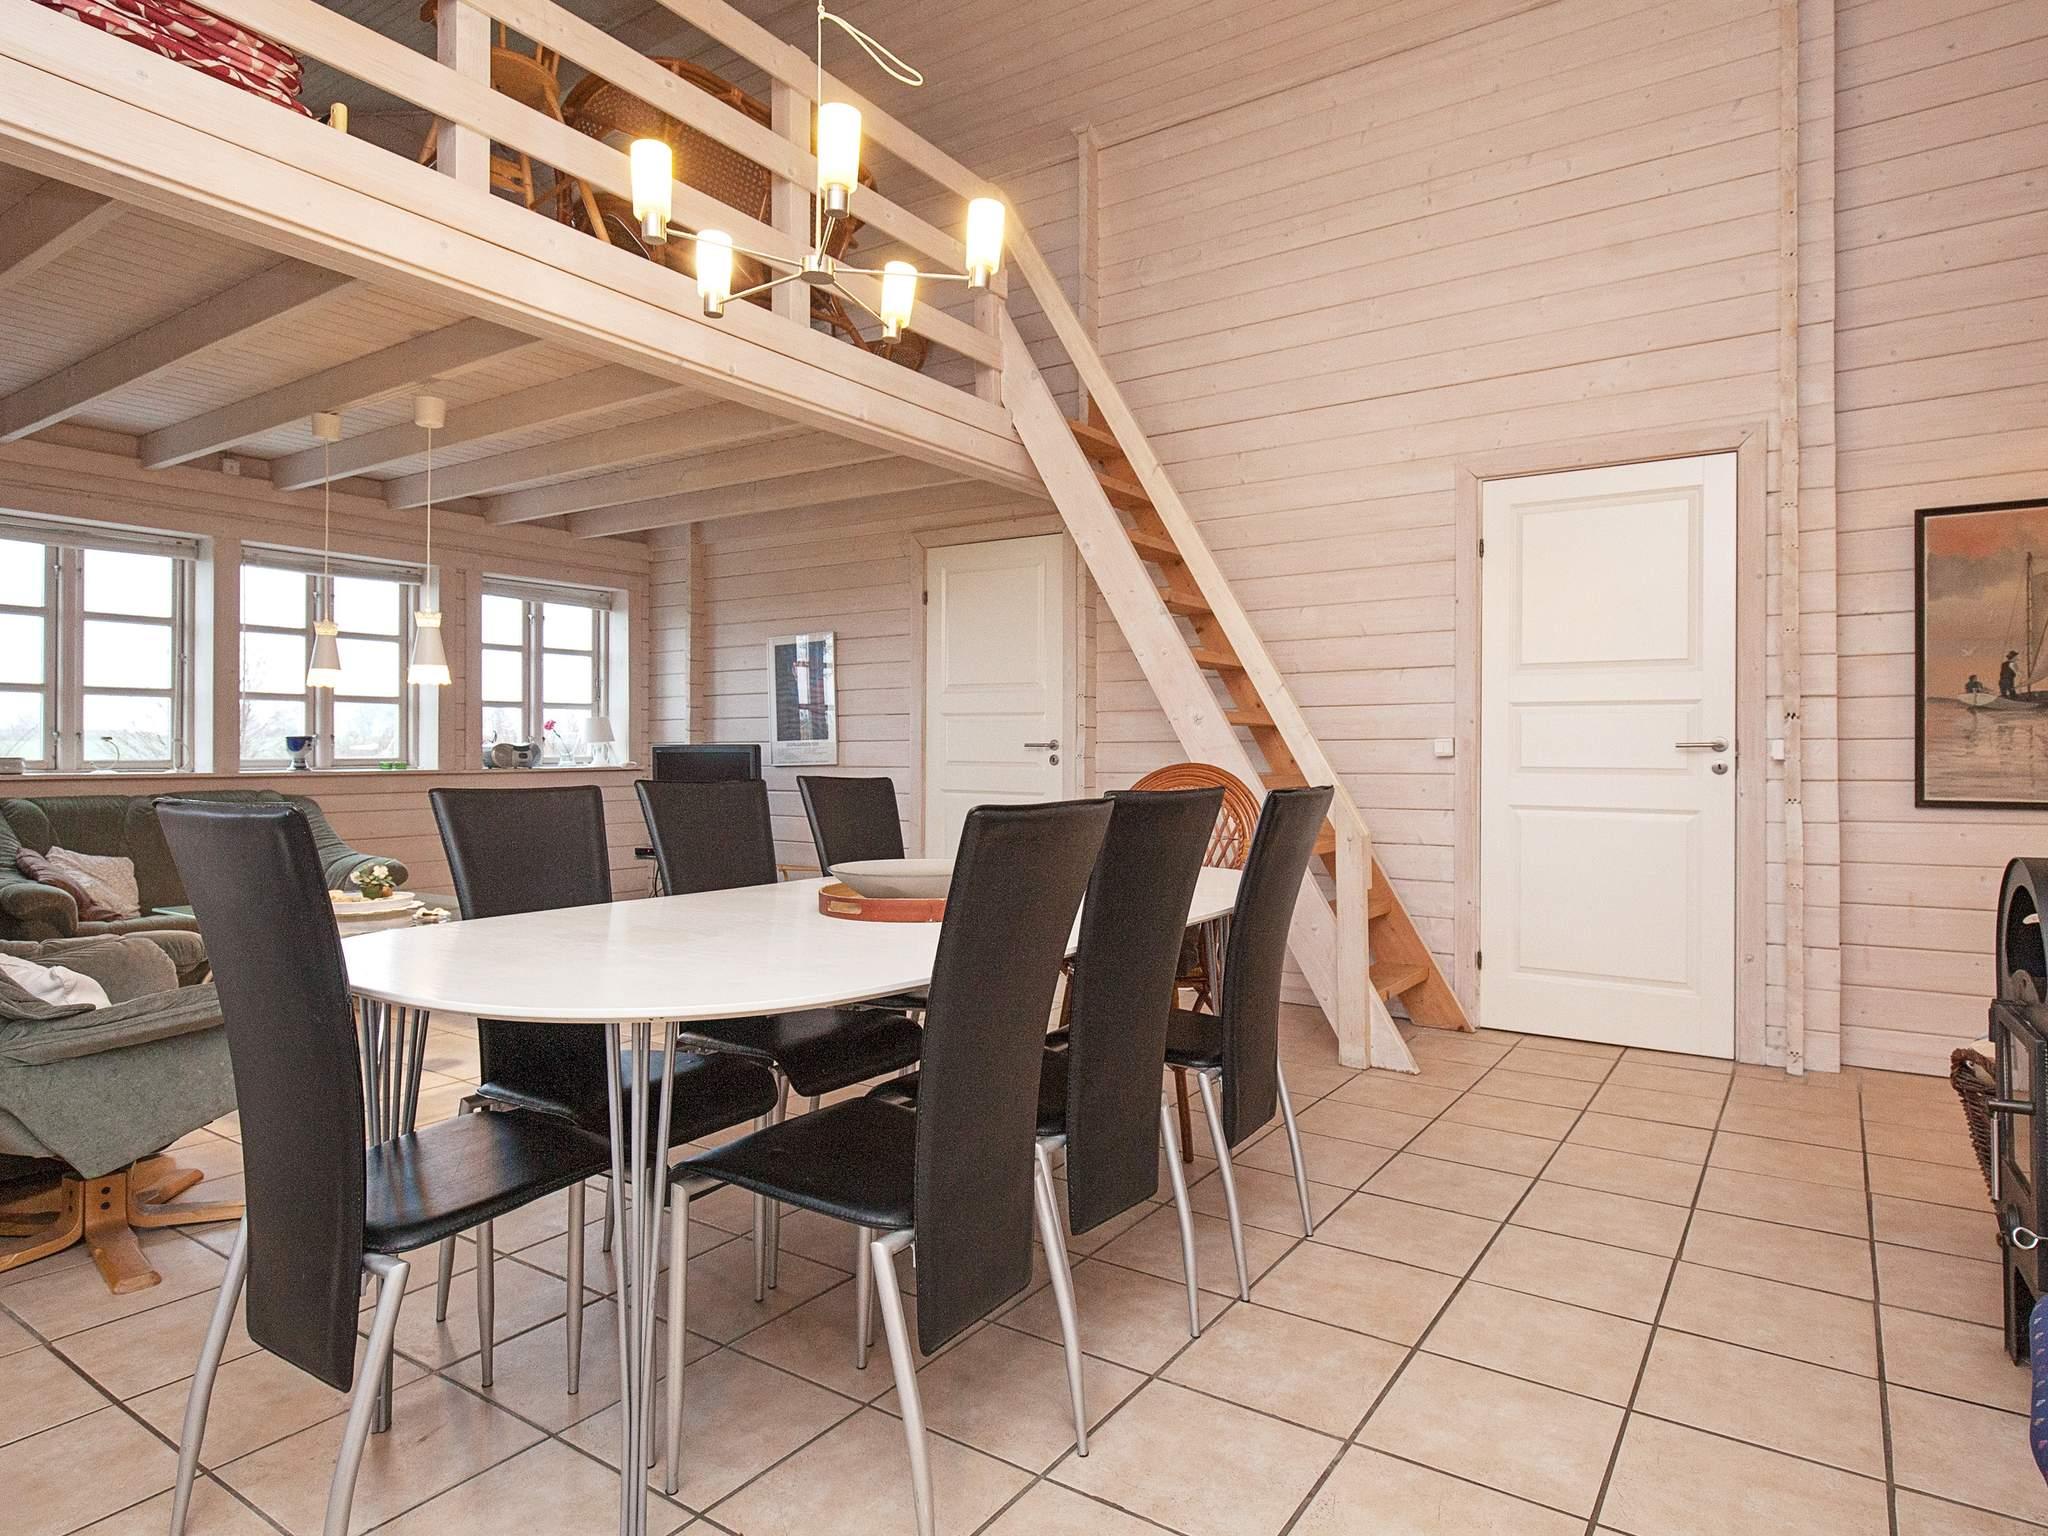 Ferienhaus Røsnæs (264063), Kalundborg, , Westseeland, Dänemark, Bild 5